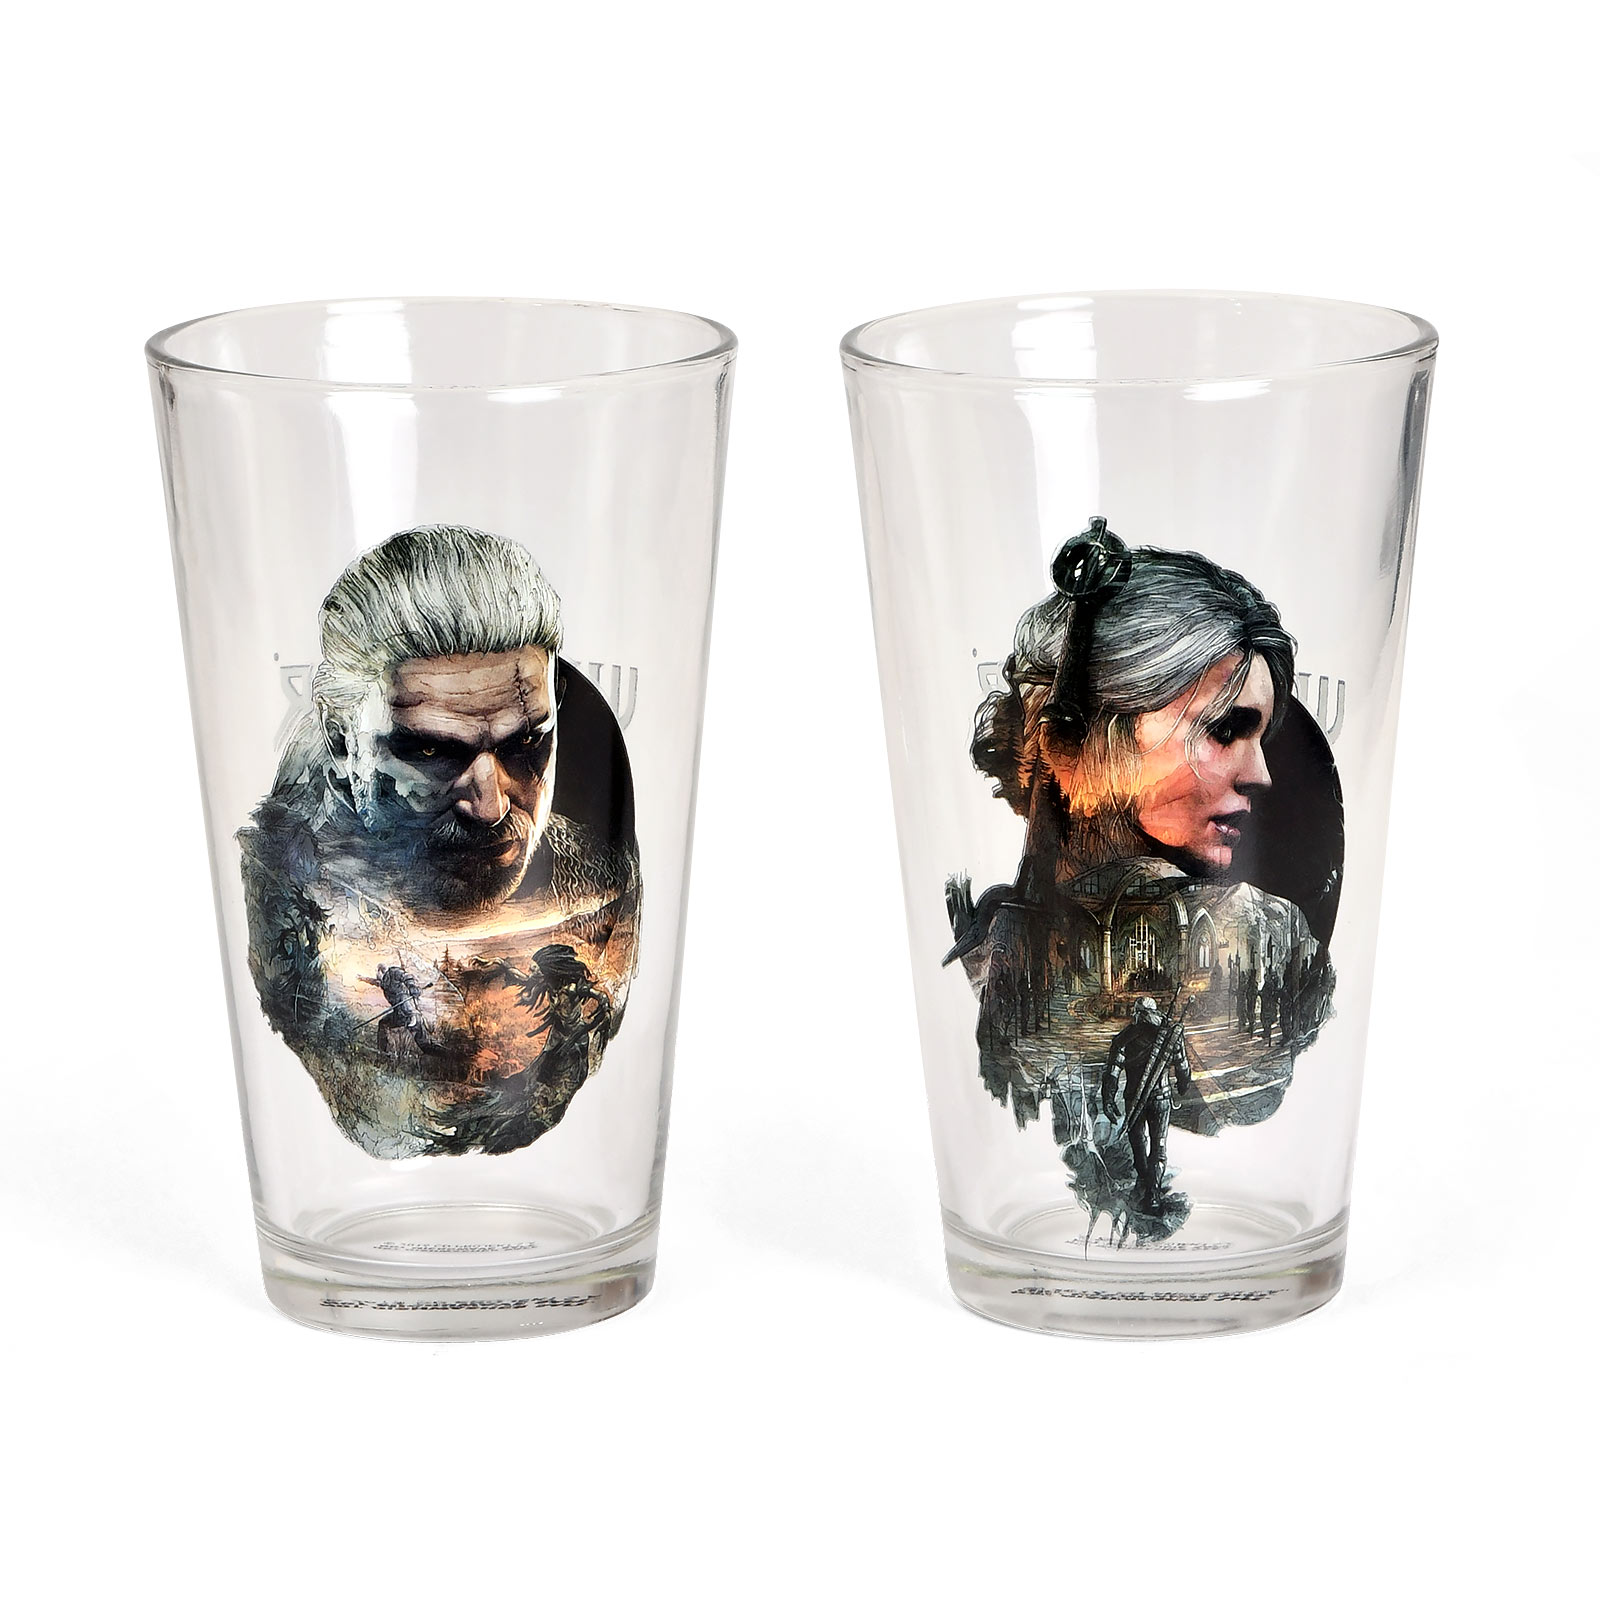 Witcher - Geralt & Ciri Gläserset